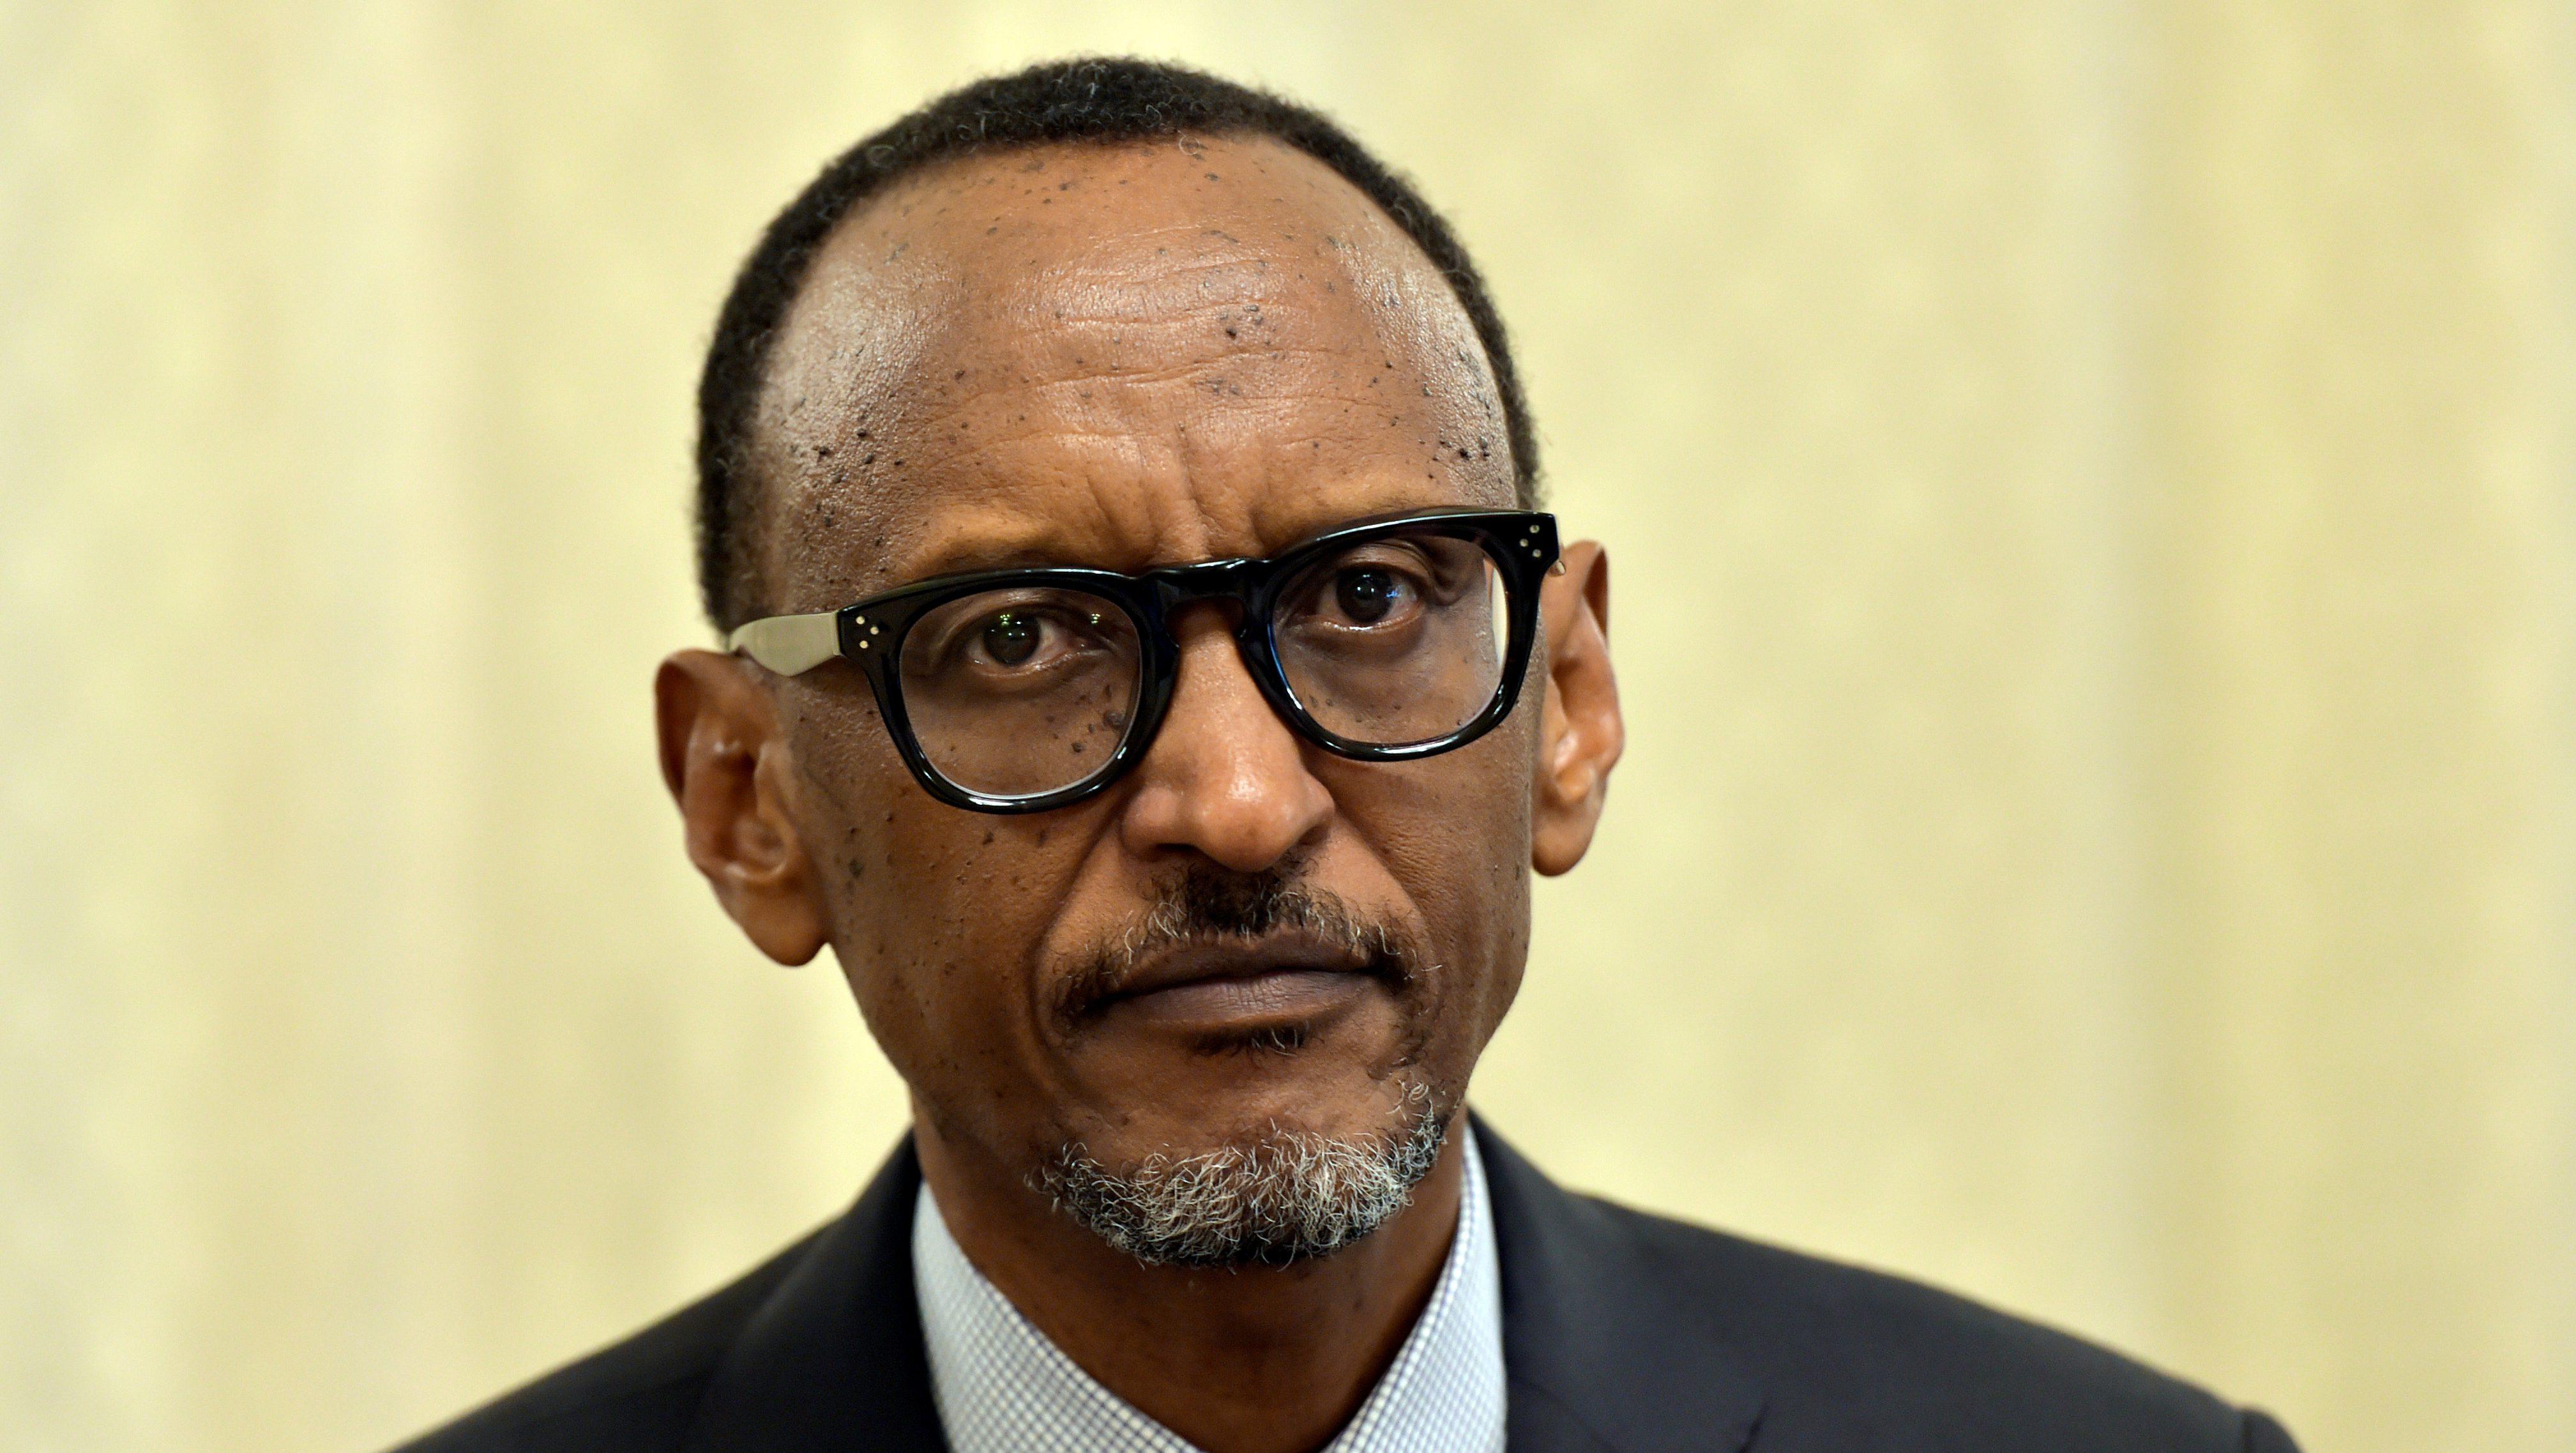 Rwanda's President Paul Kagame looks on as he meets Belgium's Prime Minister Charles Michel in Brussels, Belgium June 8, 2017.